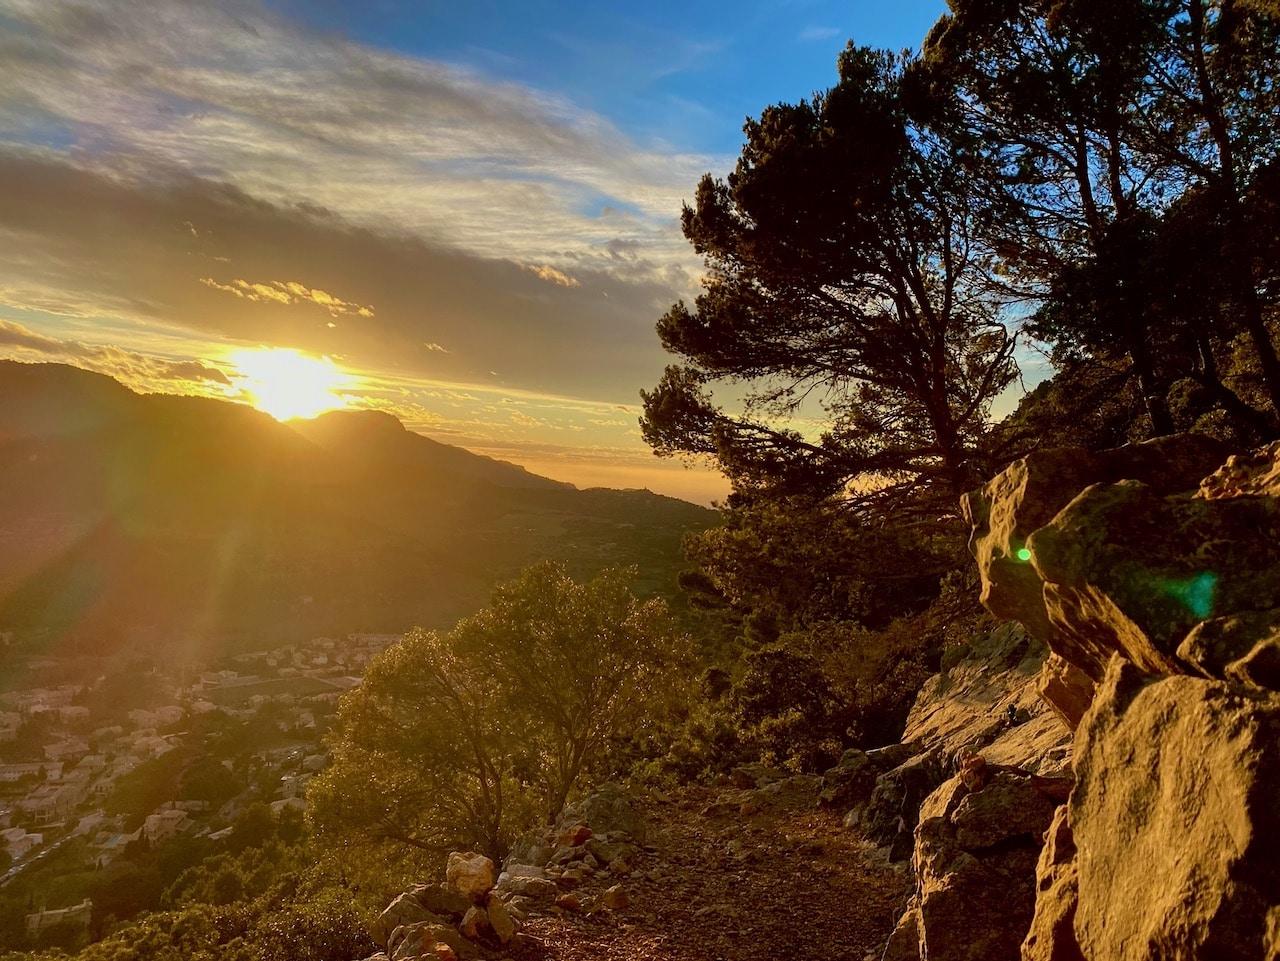 Winterurlaub auf der Insel Mallorca